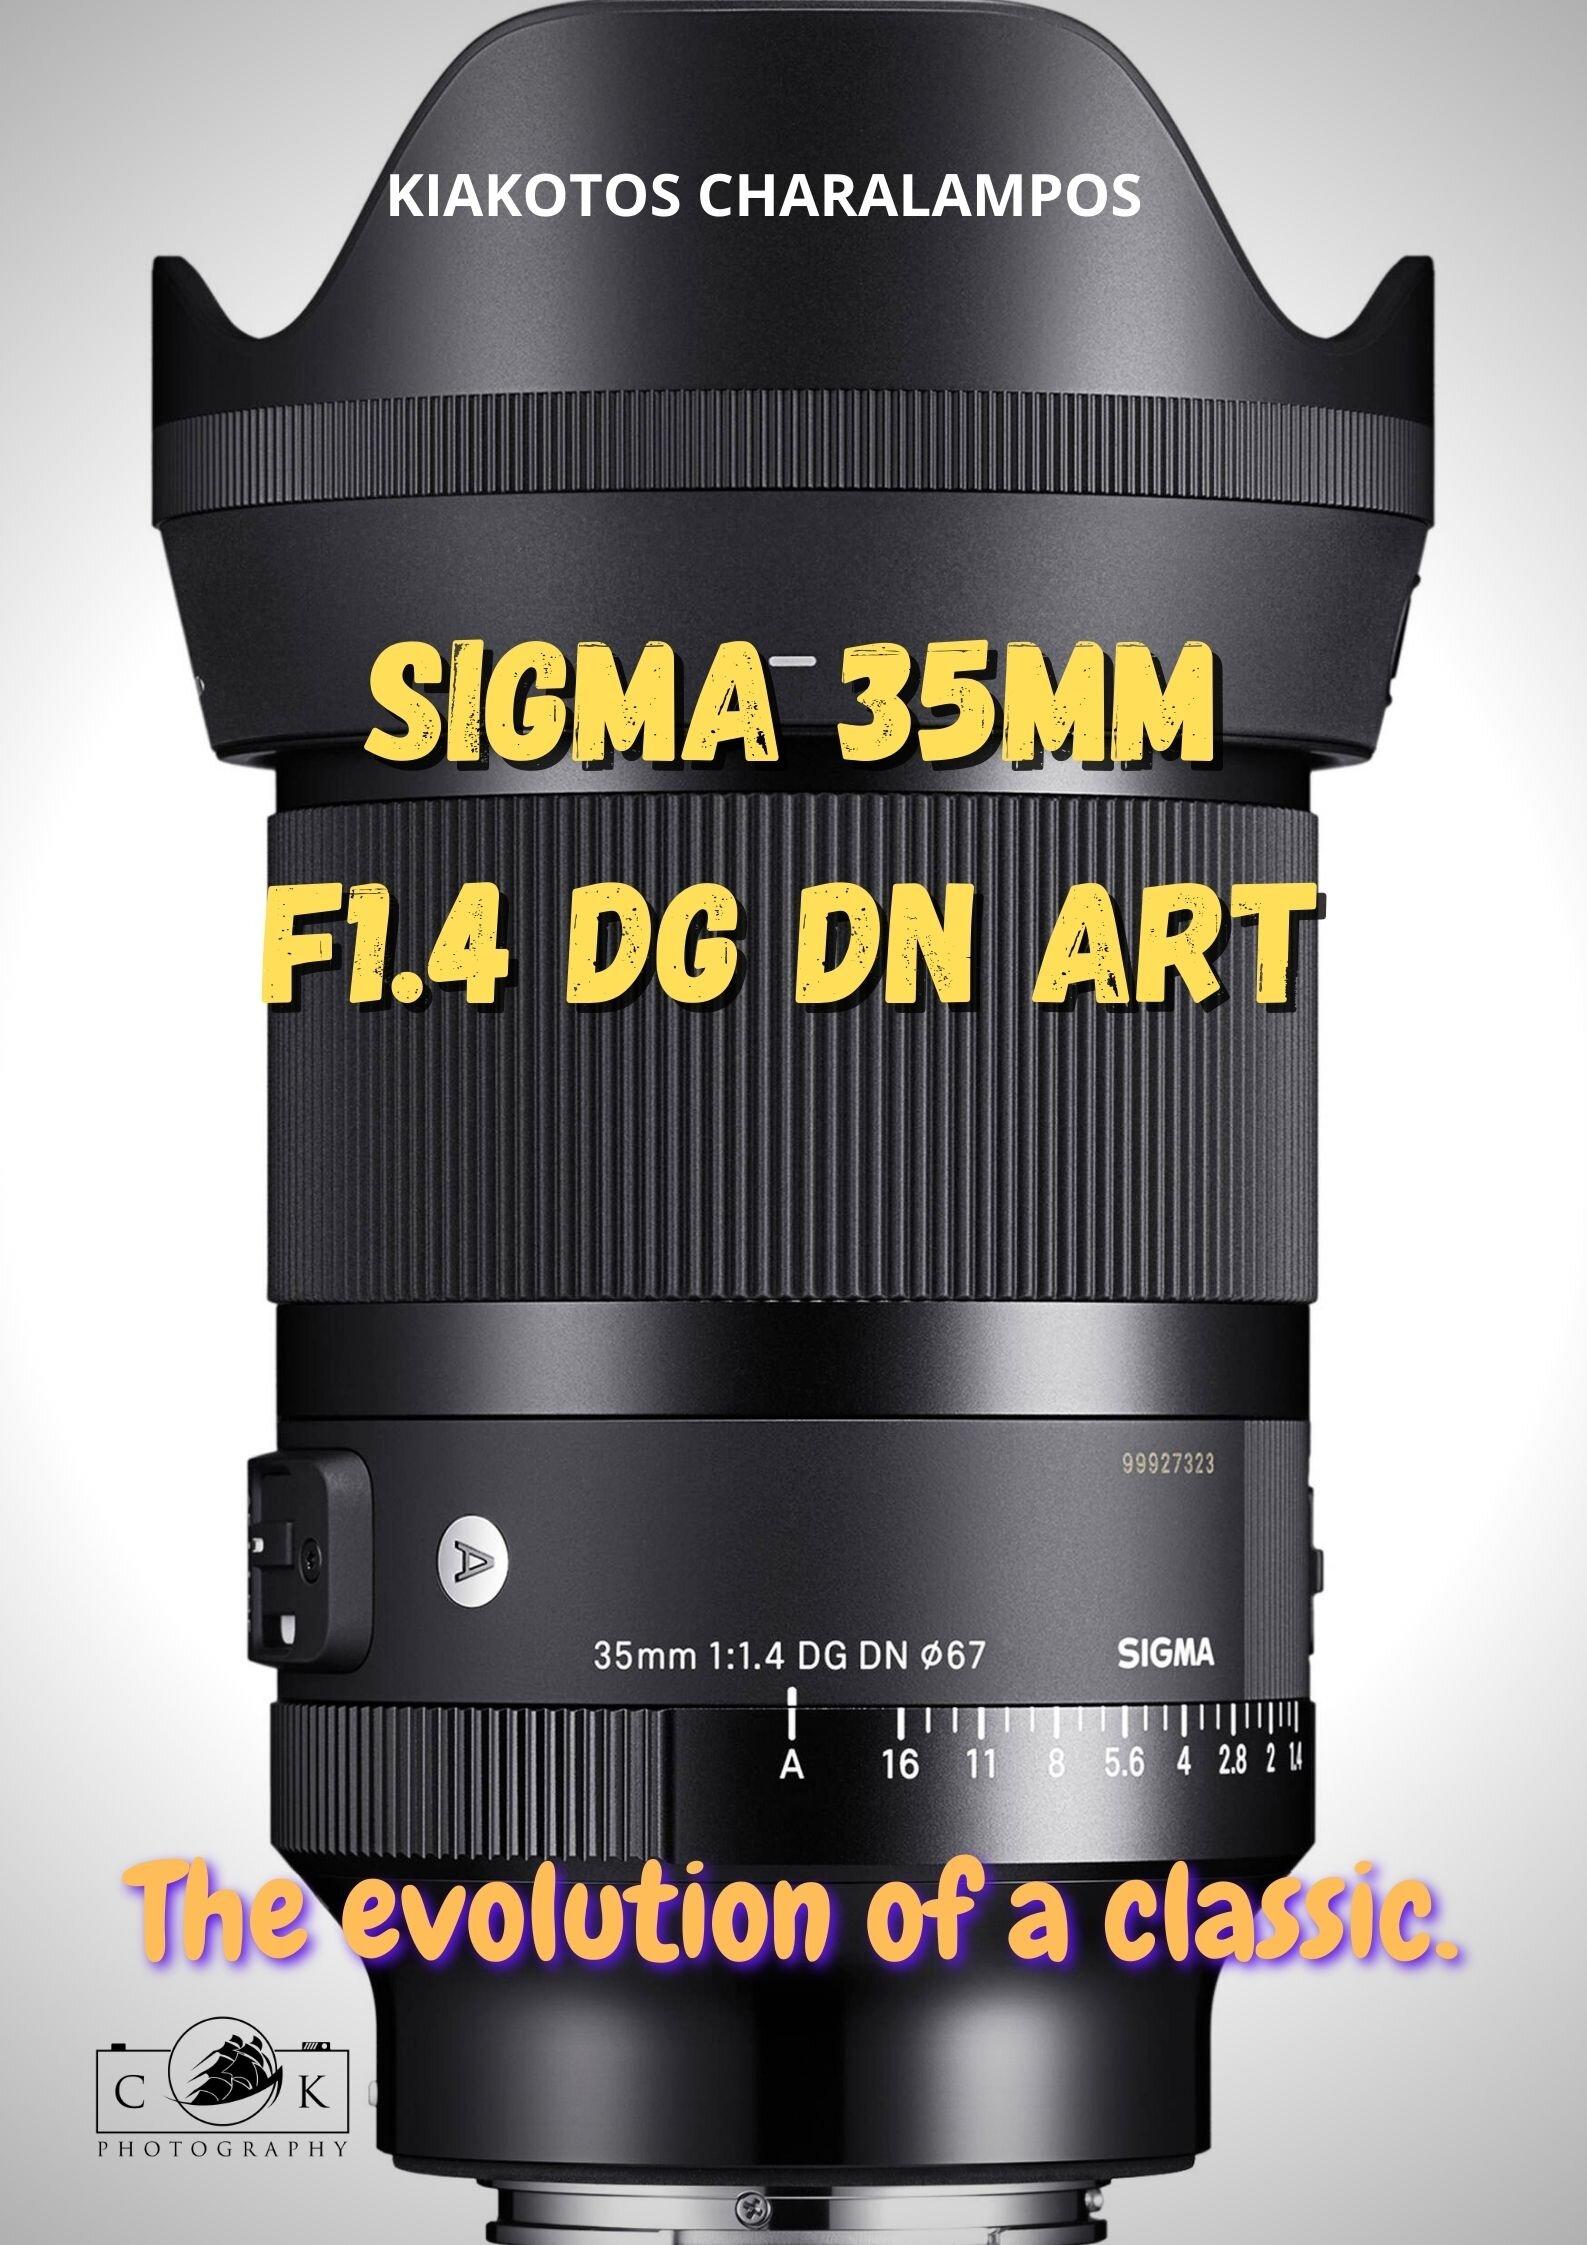 Sigma 35mm f1.4 DG DN Art | Photographers Blog